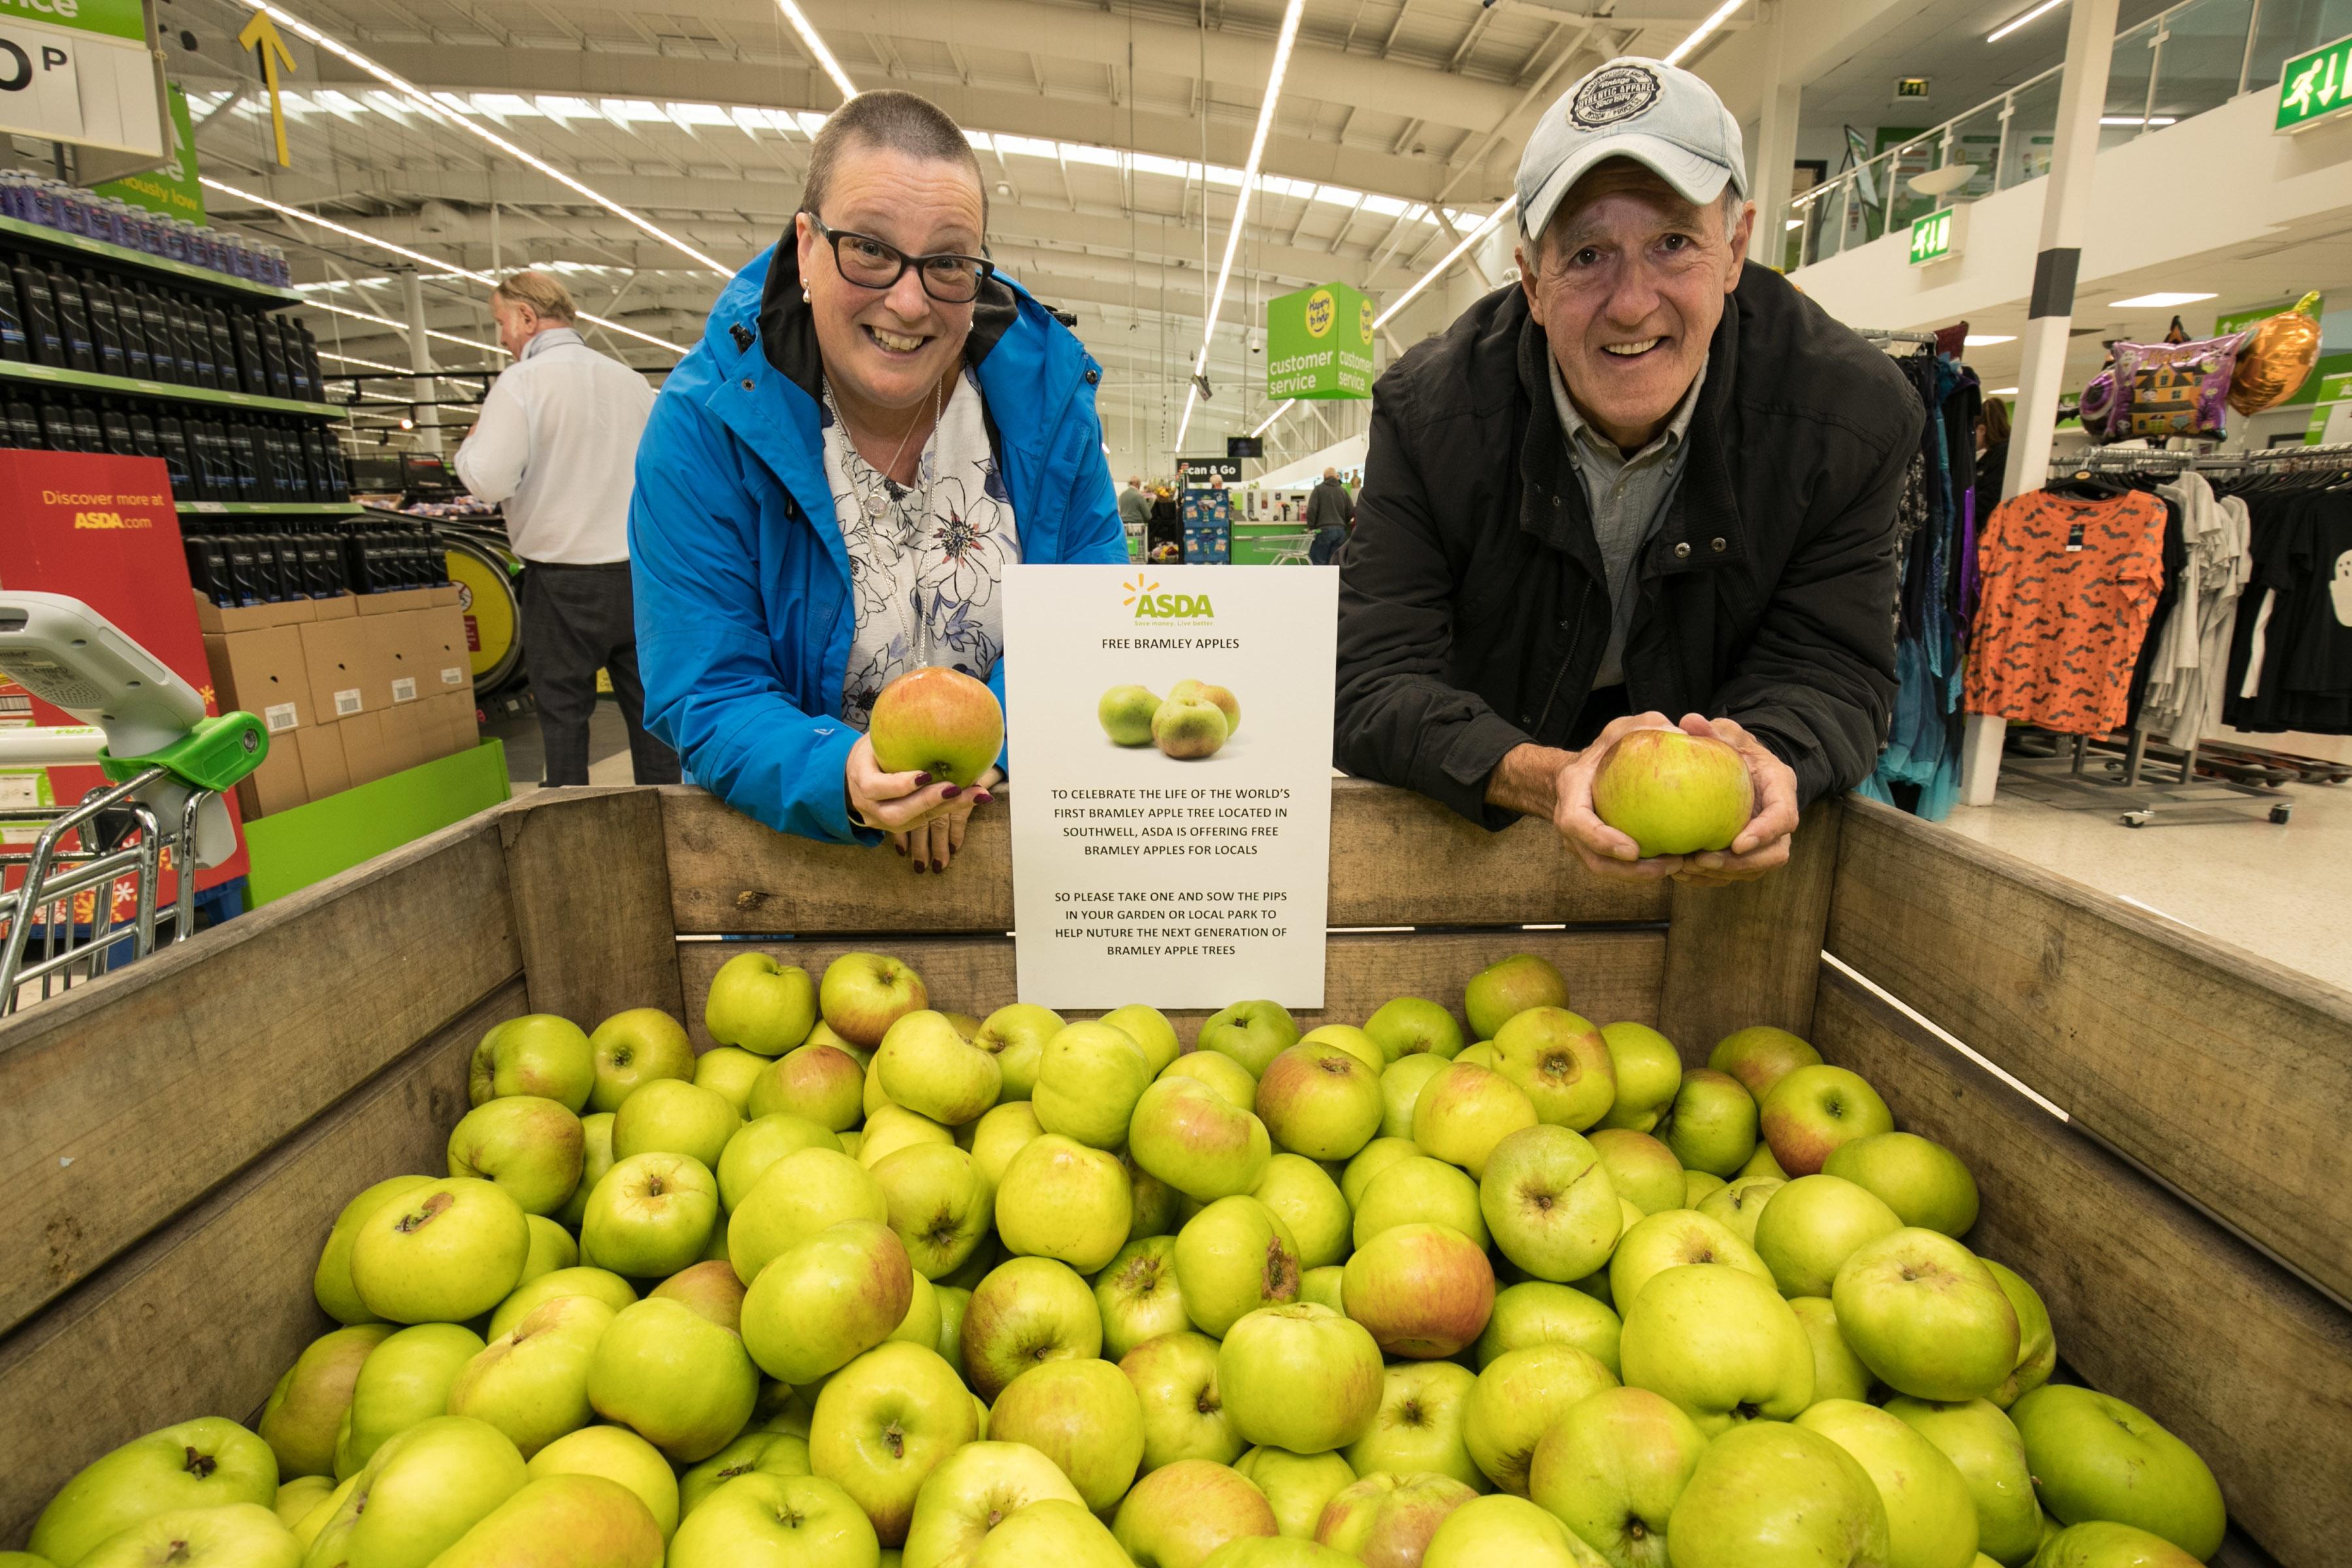 Customers pick up a free apple at Asda West Bridgford